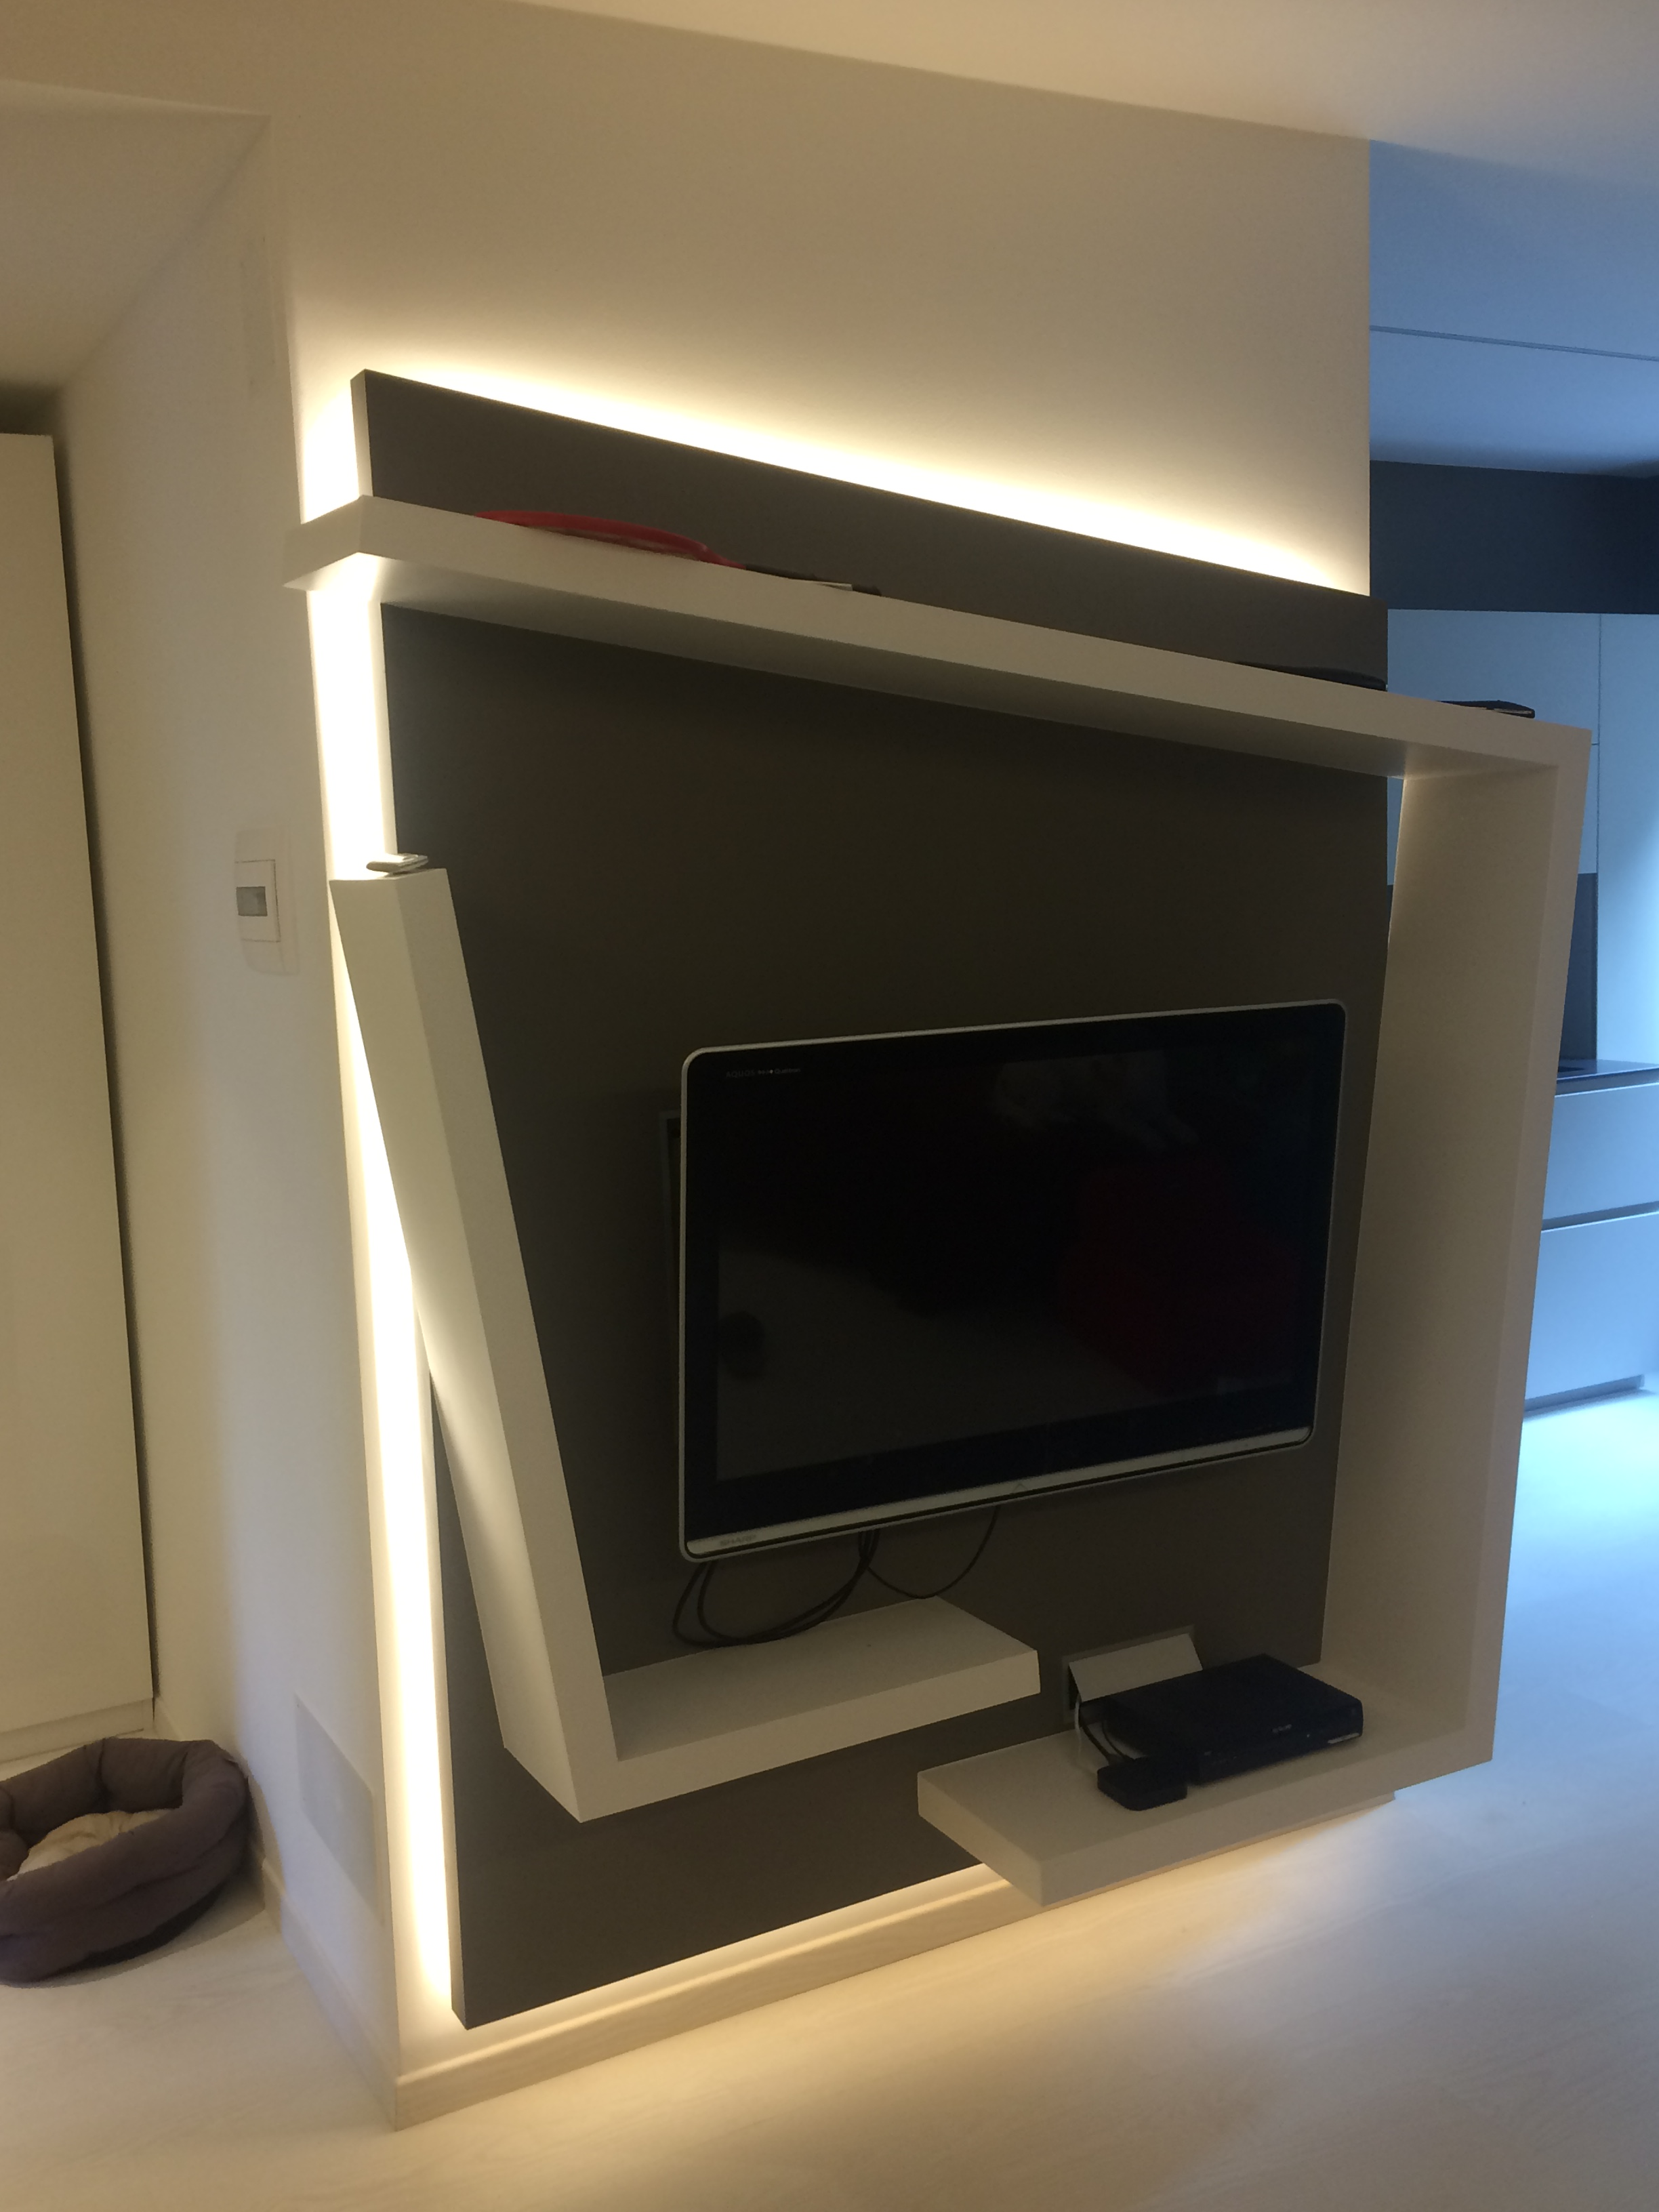 Porta tv in cartongesso - Porta tv in cartongesso ...